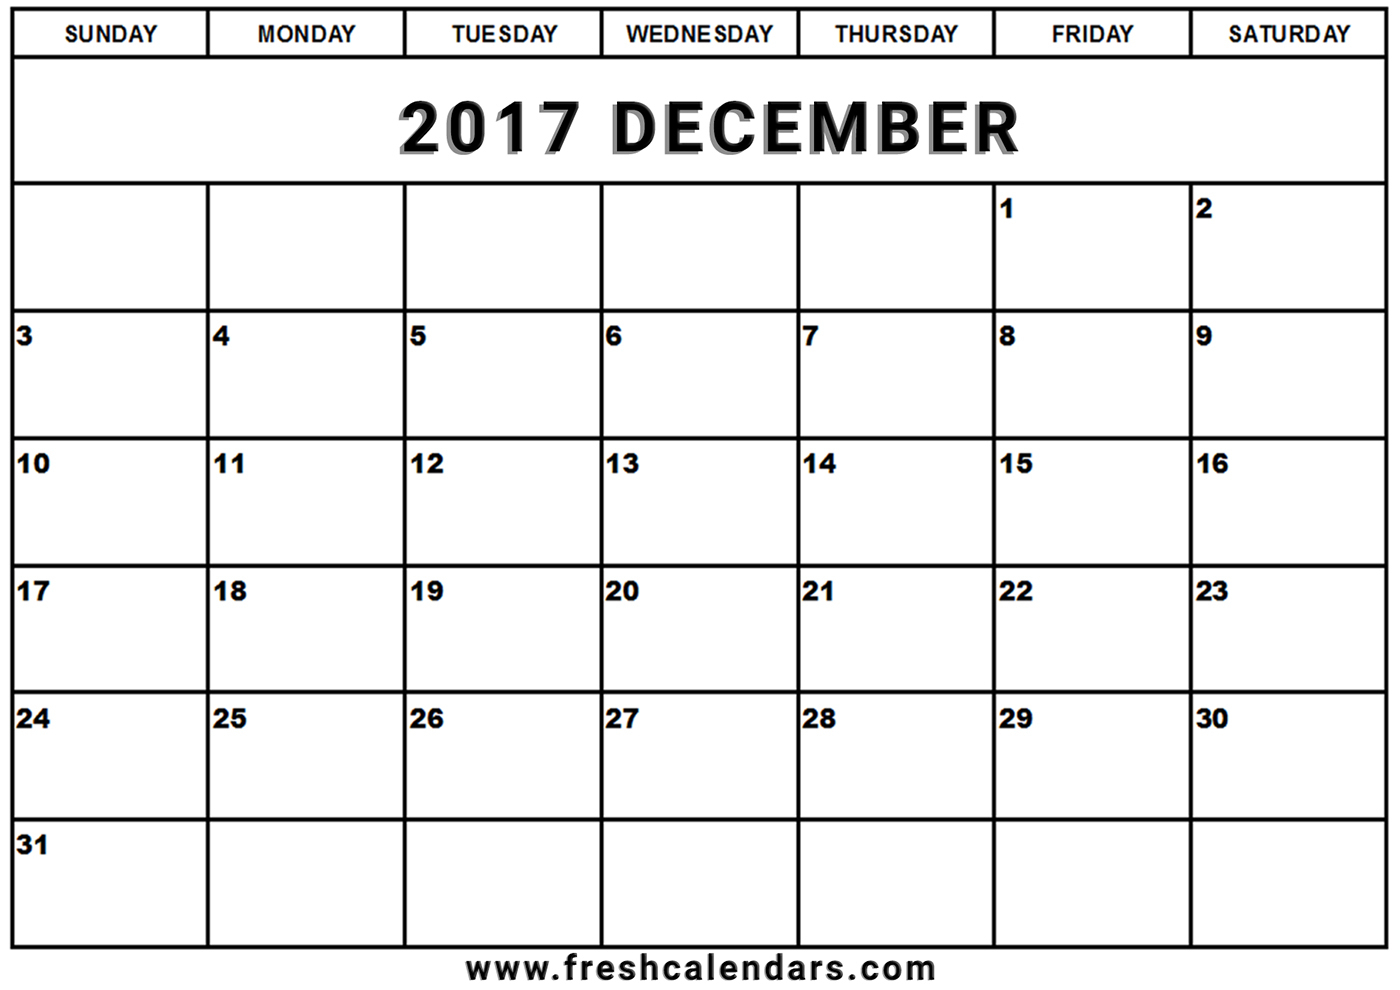 December 2017 Calendar Printable - Fresh Calendars with regard to Blank Printable December Calandar